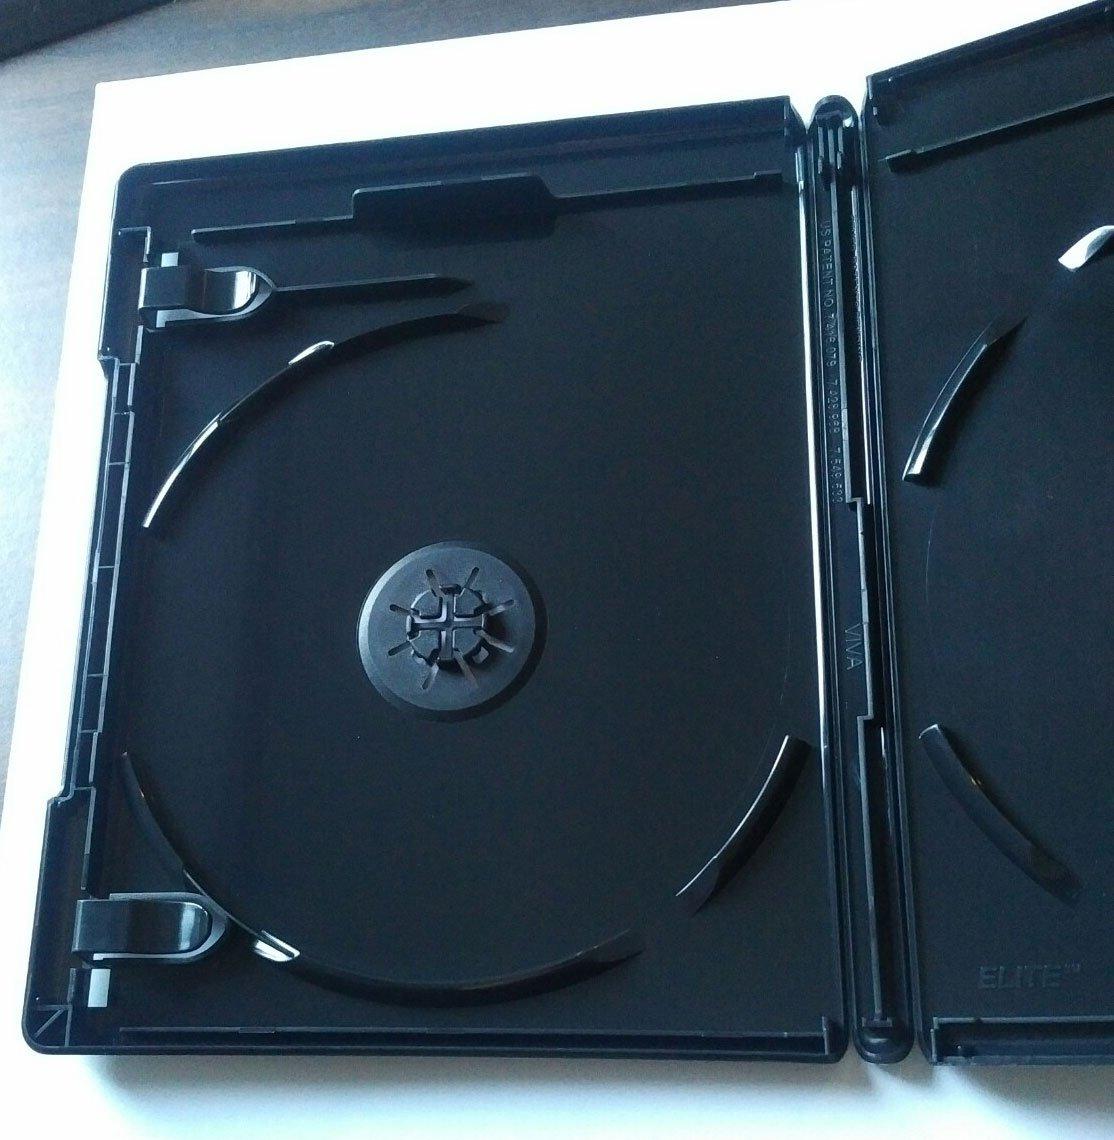 NEW! 5 PK Premium VIVA ELITE Double Discs 4K Ultra HD Black Blu-ray Replace Case Holder